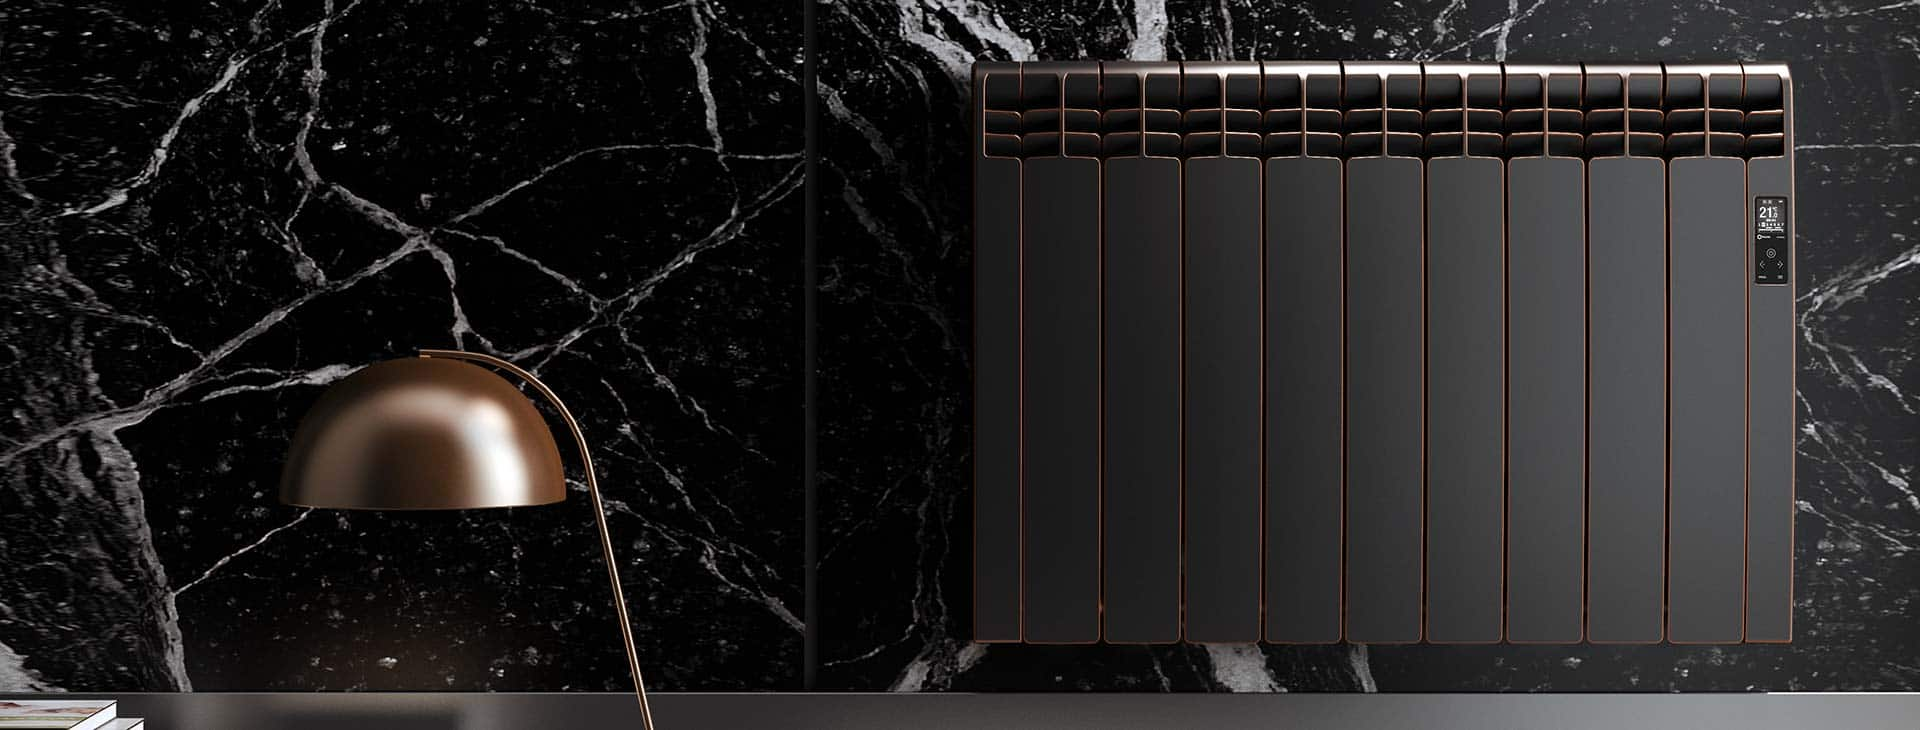 Rointe designer radiator in maldives finish with matt black edged in copper